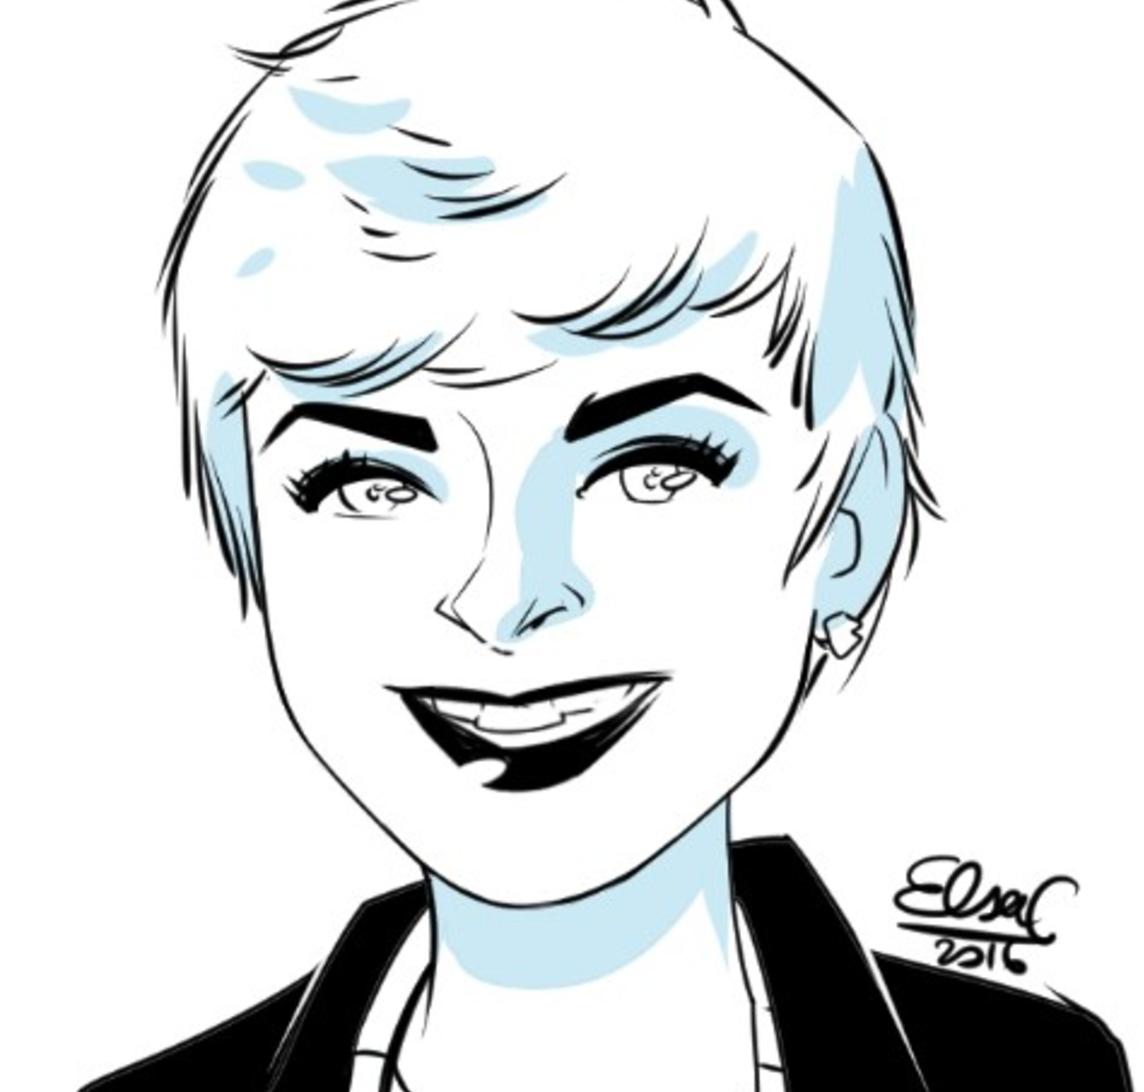 An illustration of Silverstein by Elsa Charretier.